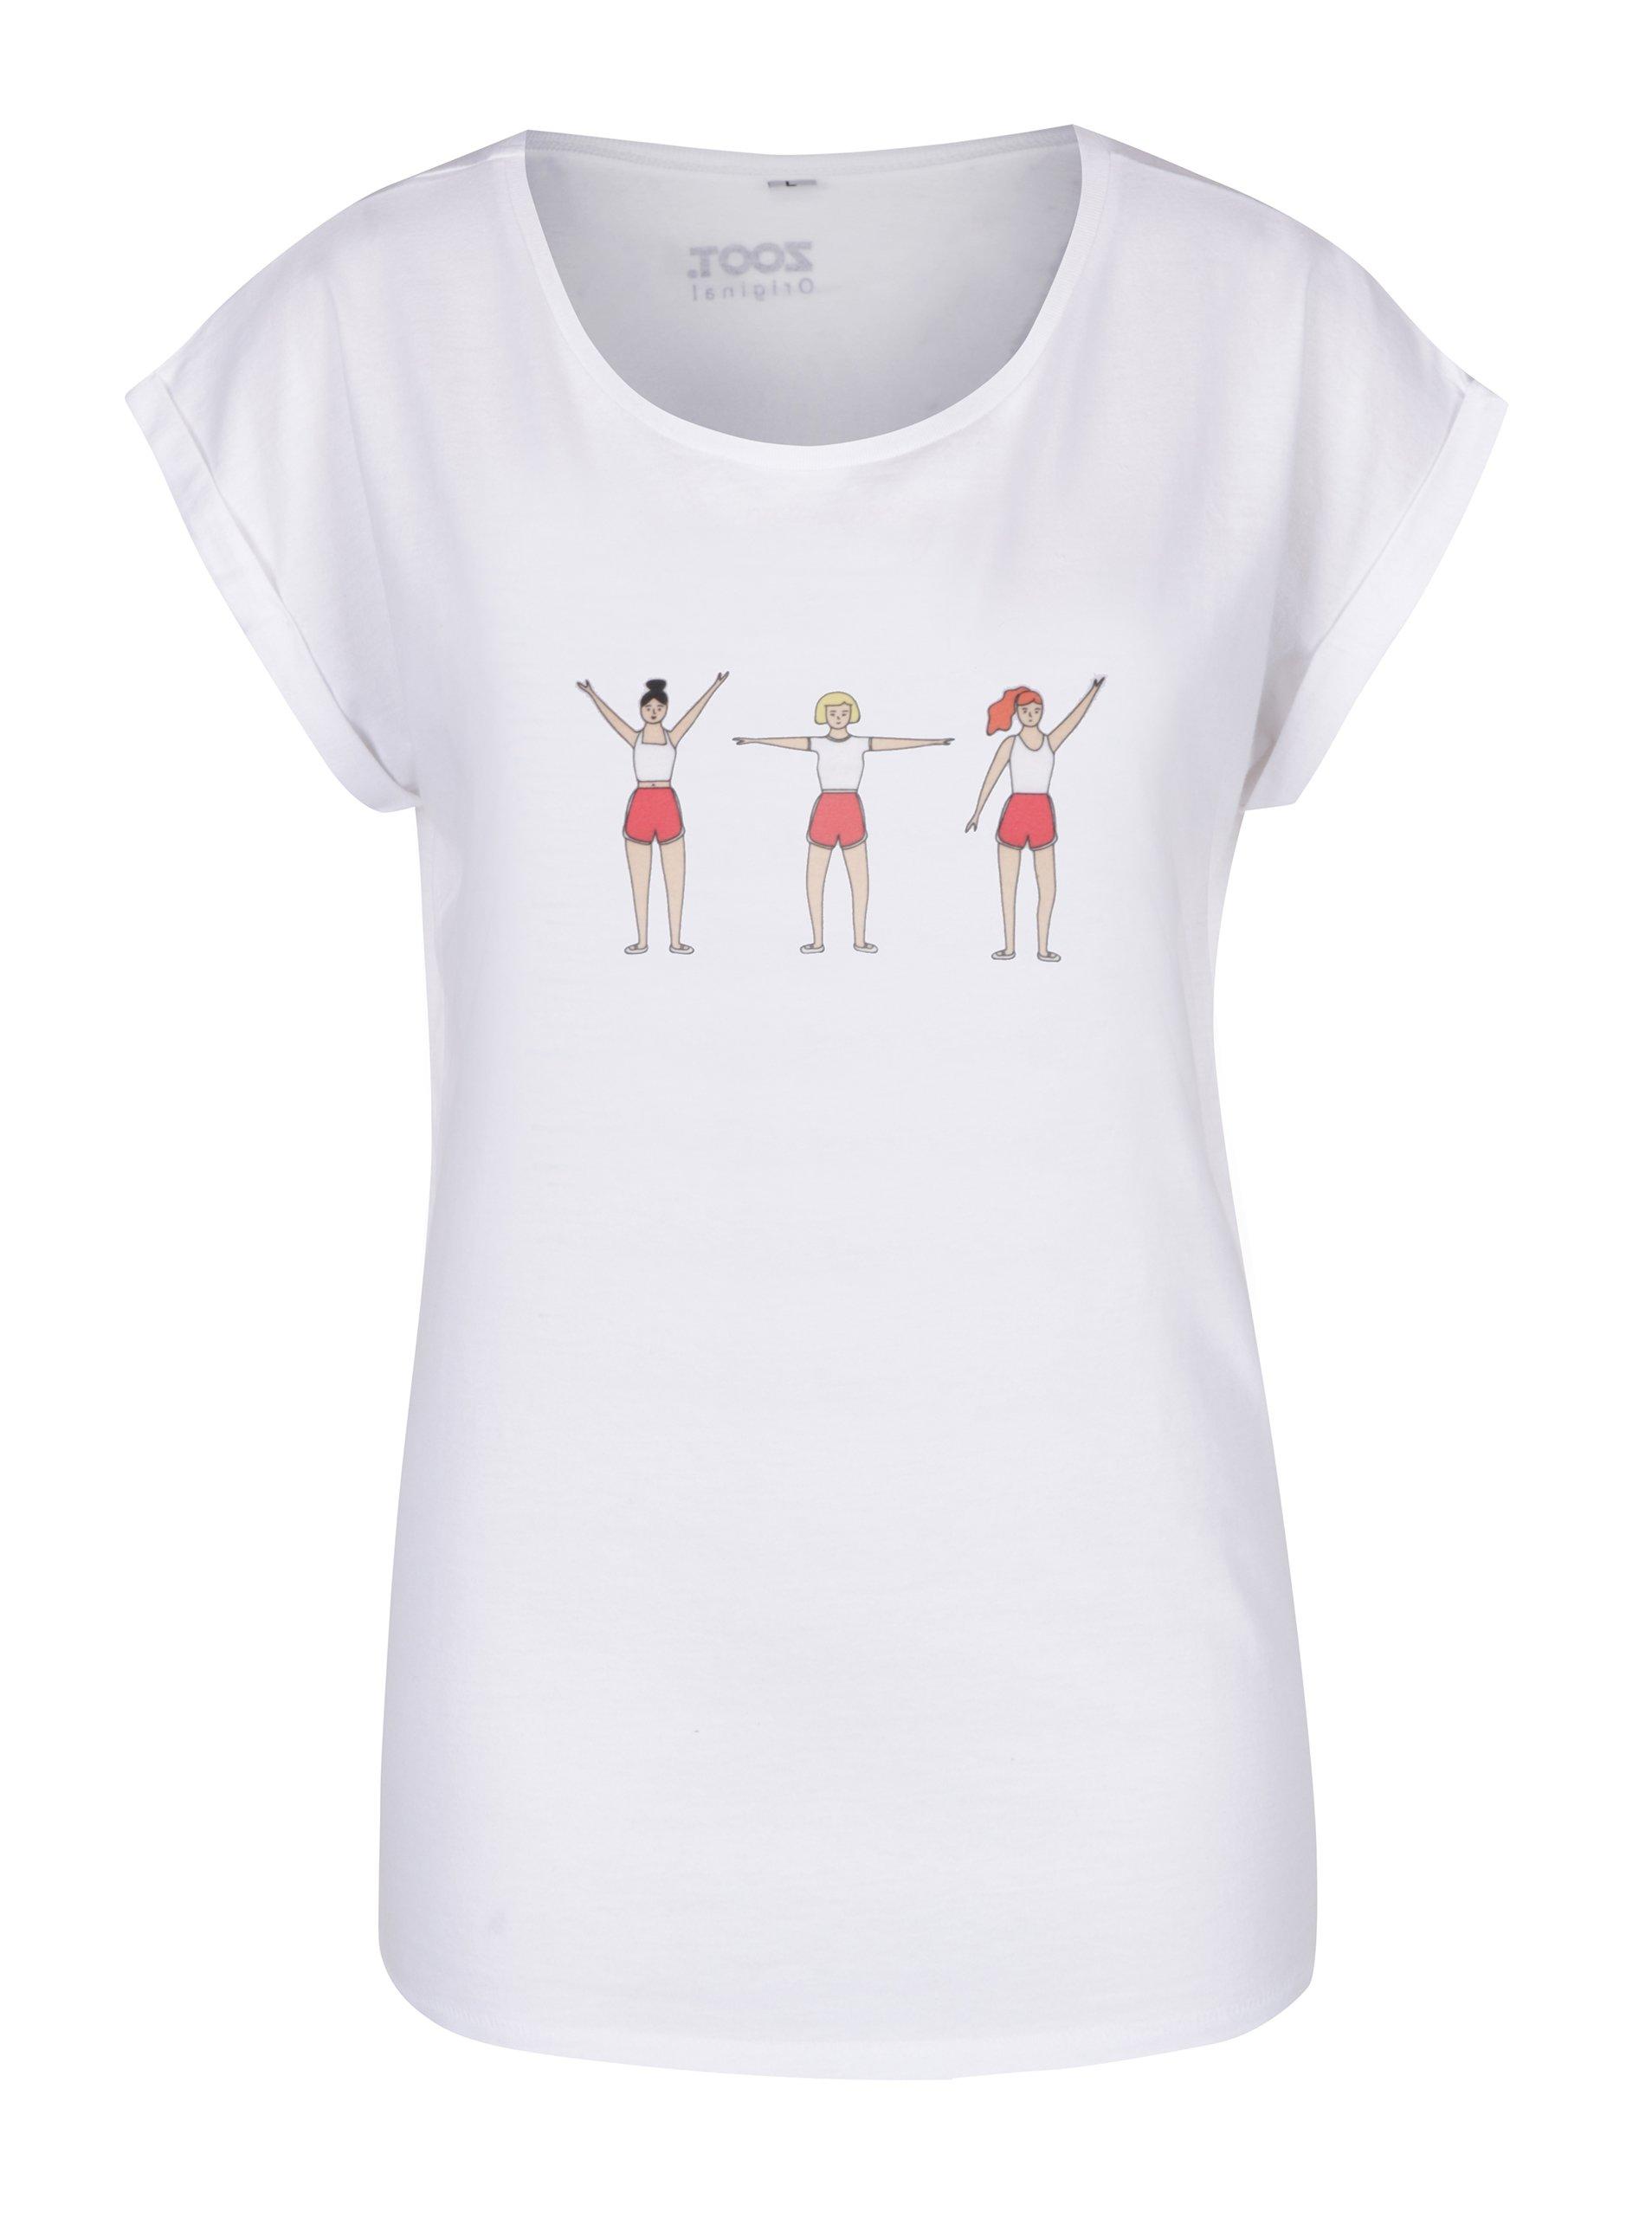 Bílé dámské tričko ZOOT Originál Spartakiáda